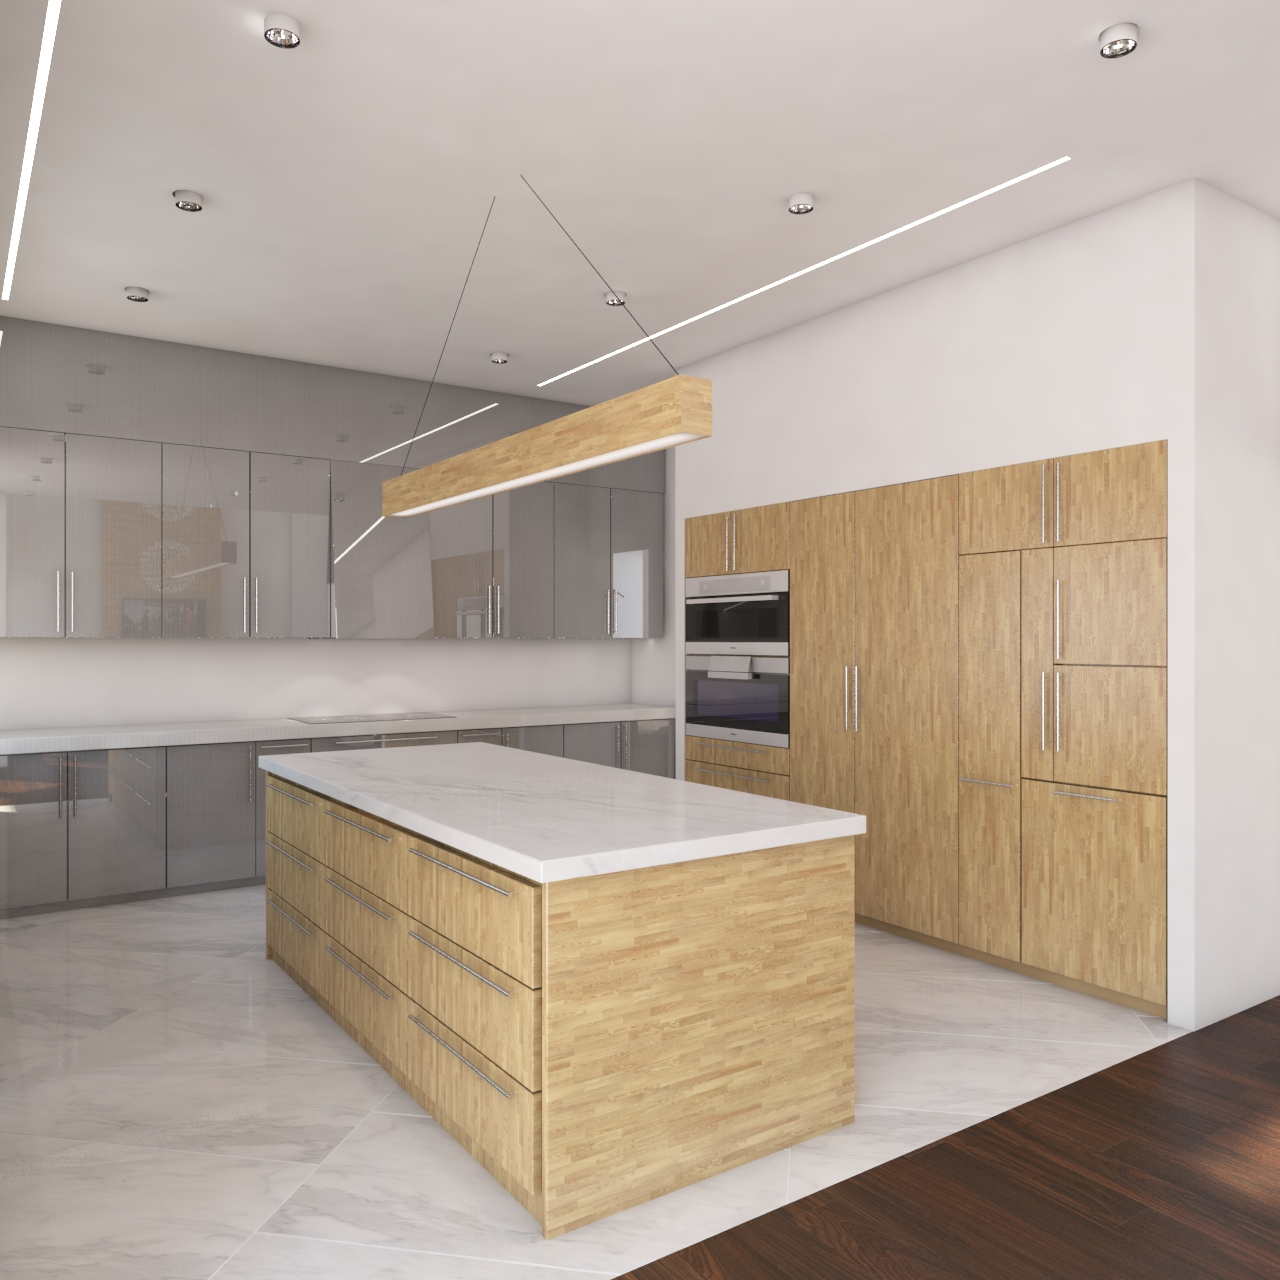 Kitchenceder.jpg